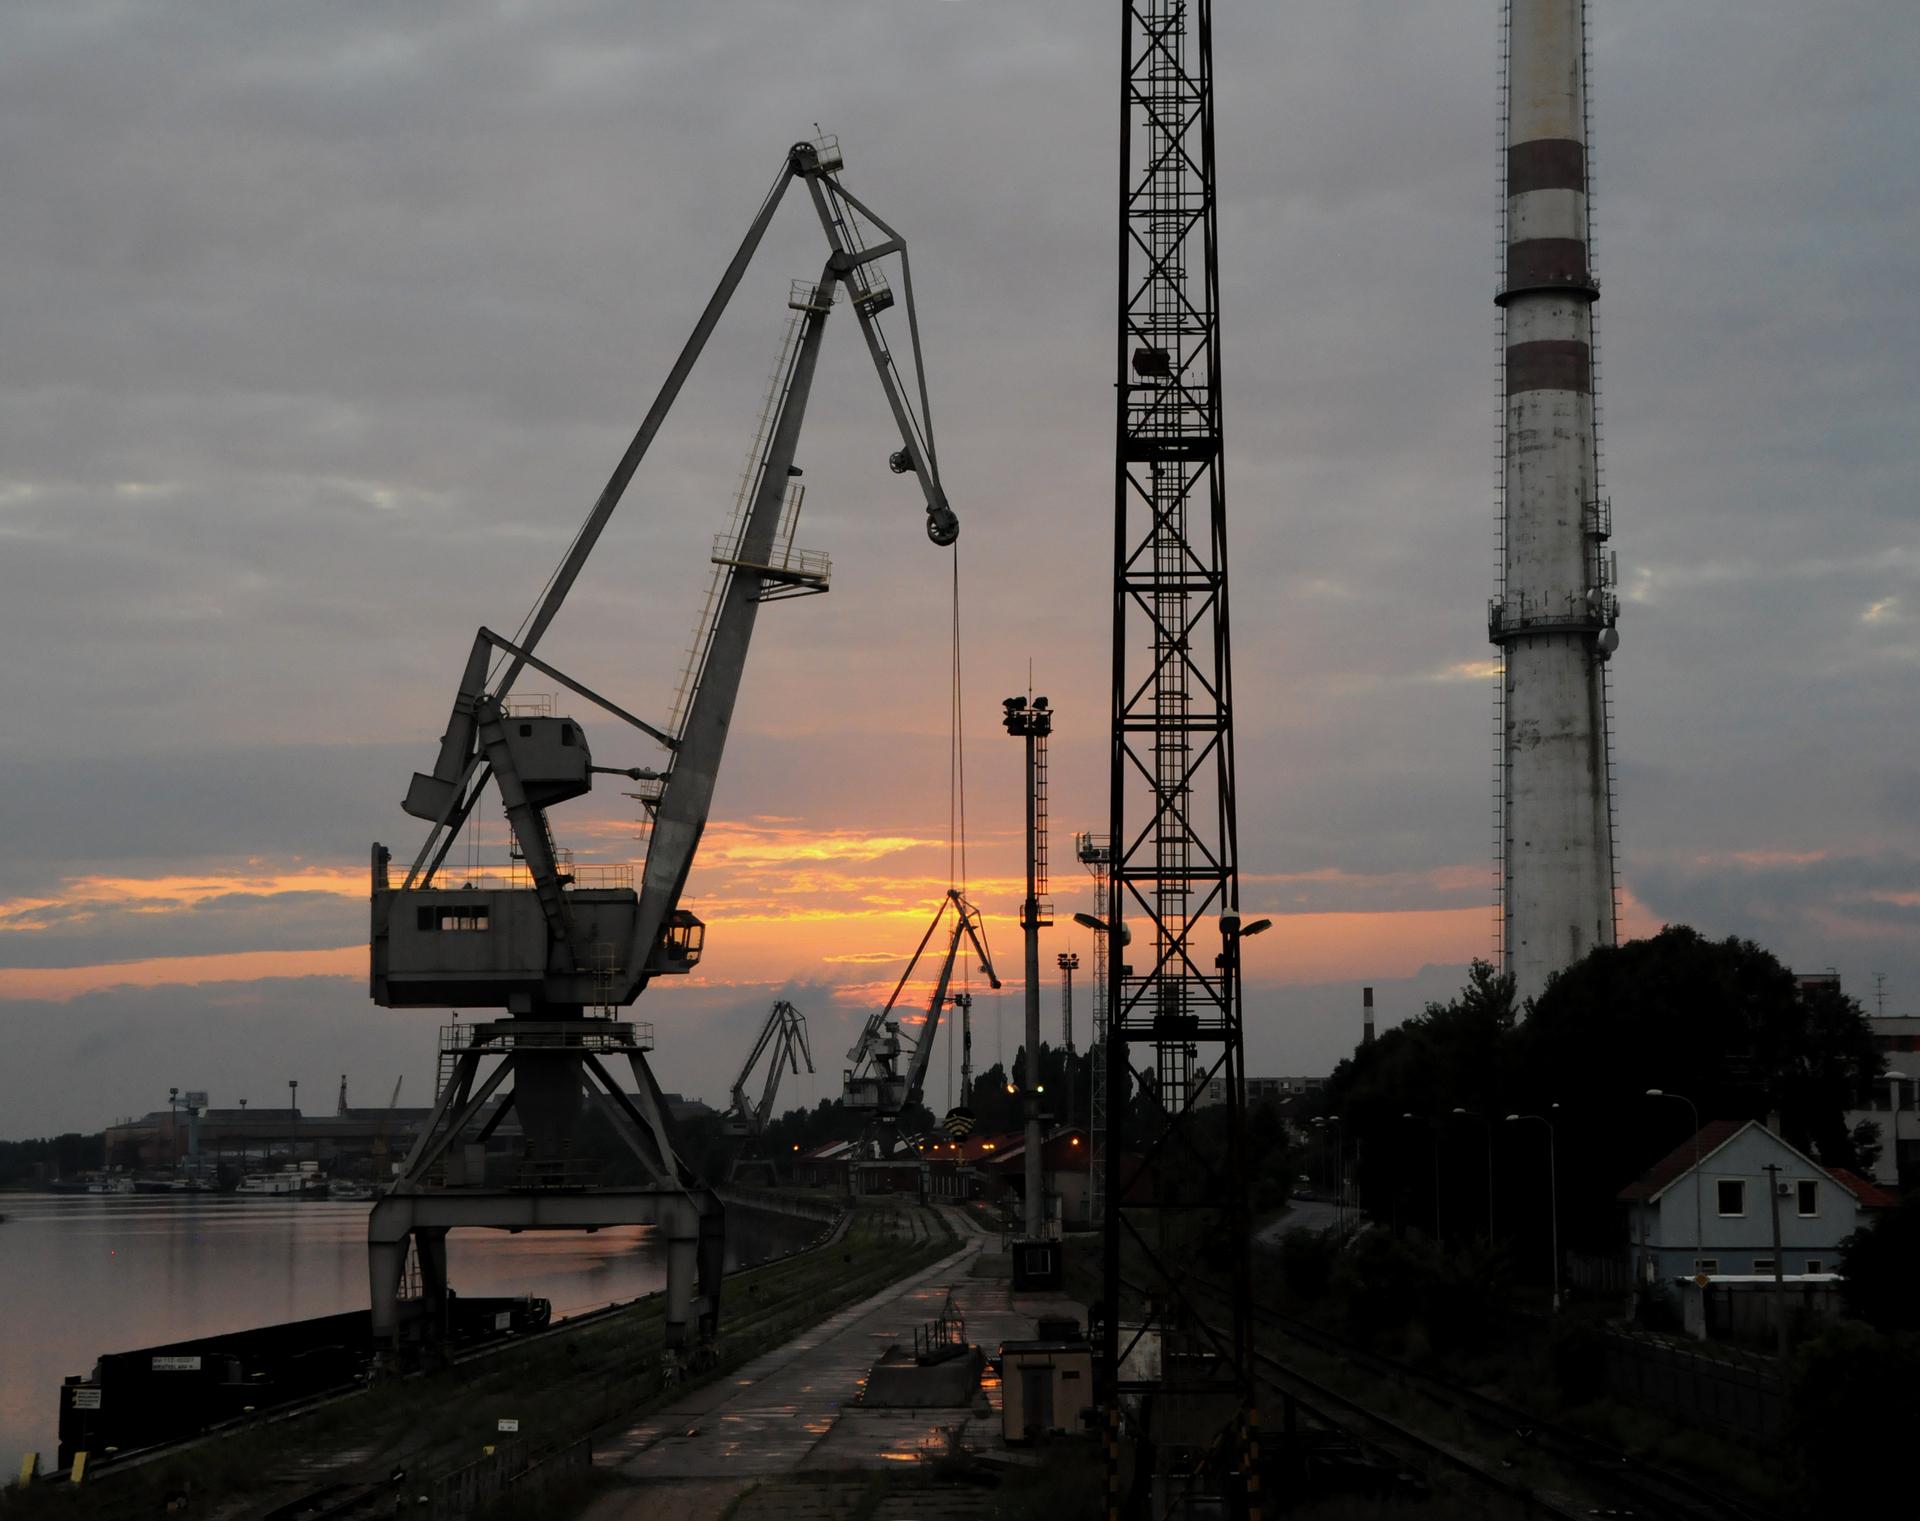 LV-industrie2 janvier 2020 DSC_5490M